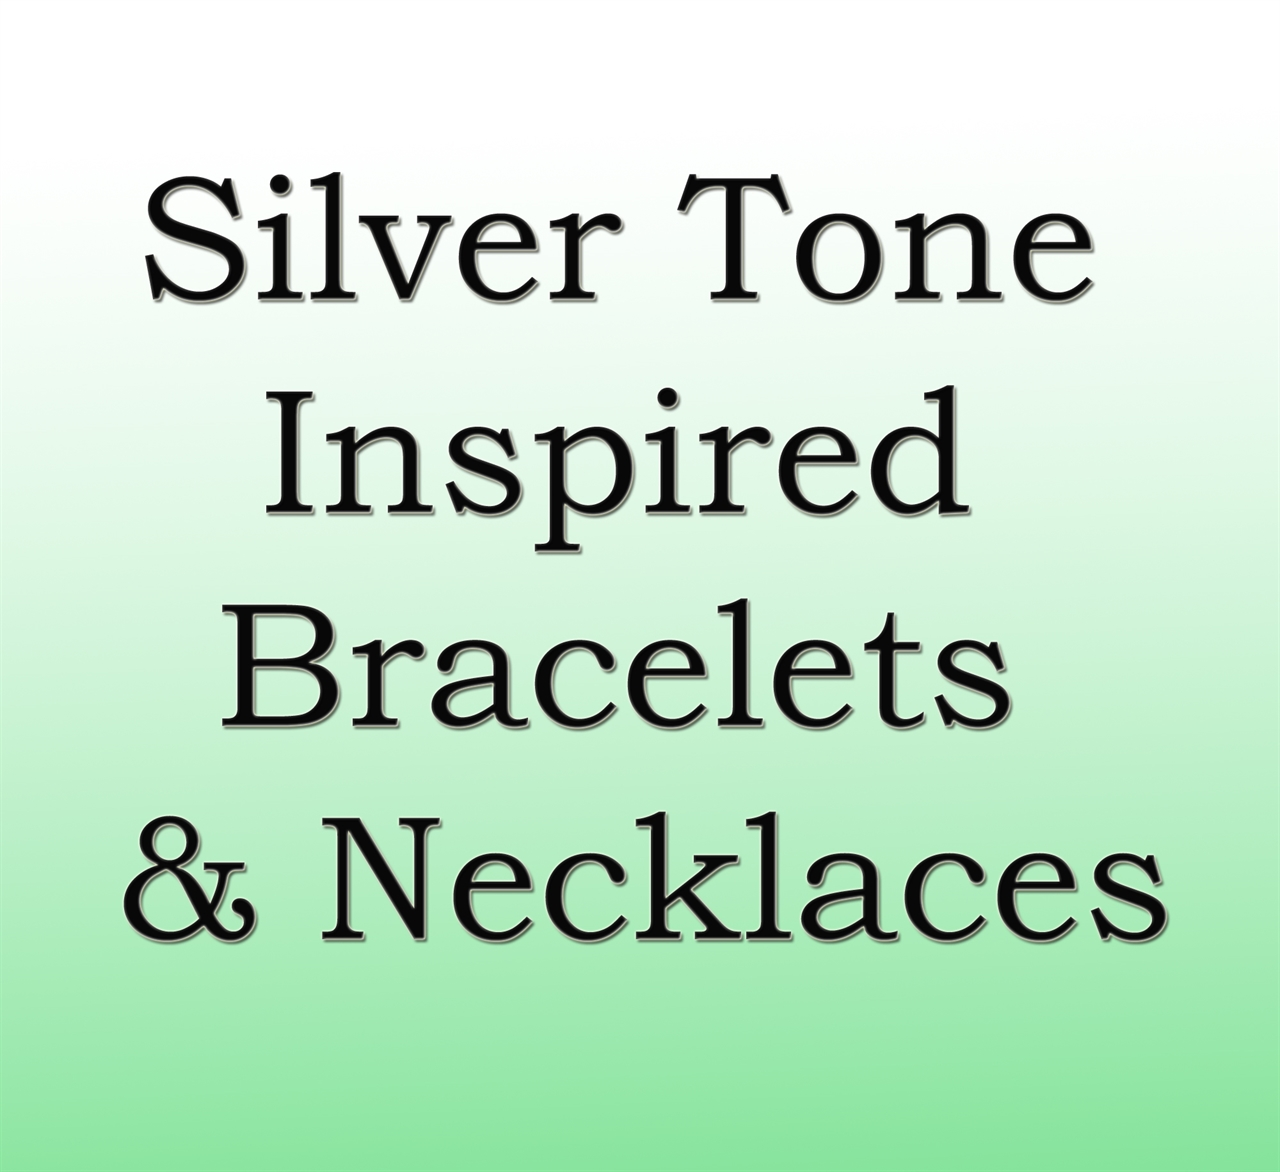 Silver Tone Inspired Bracelets